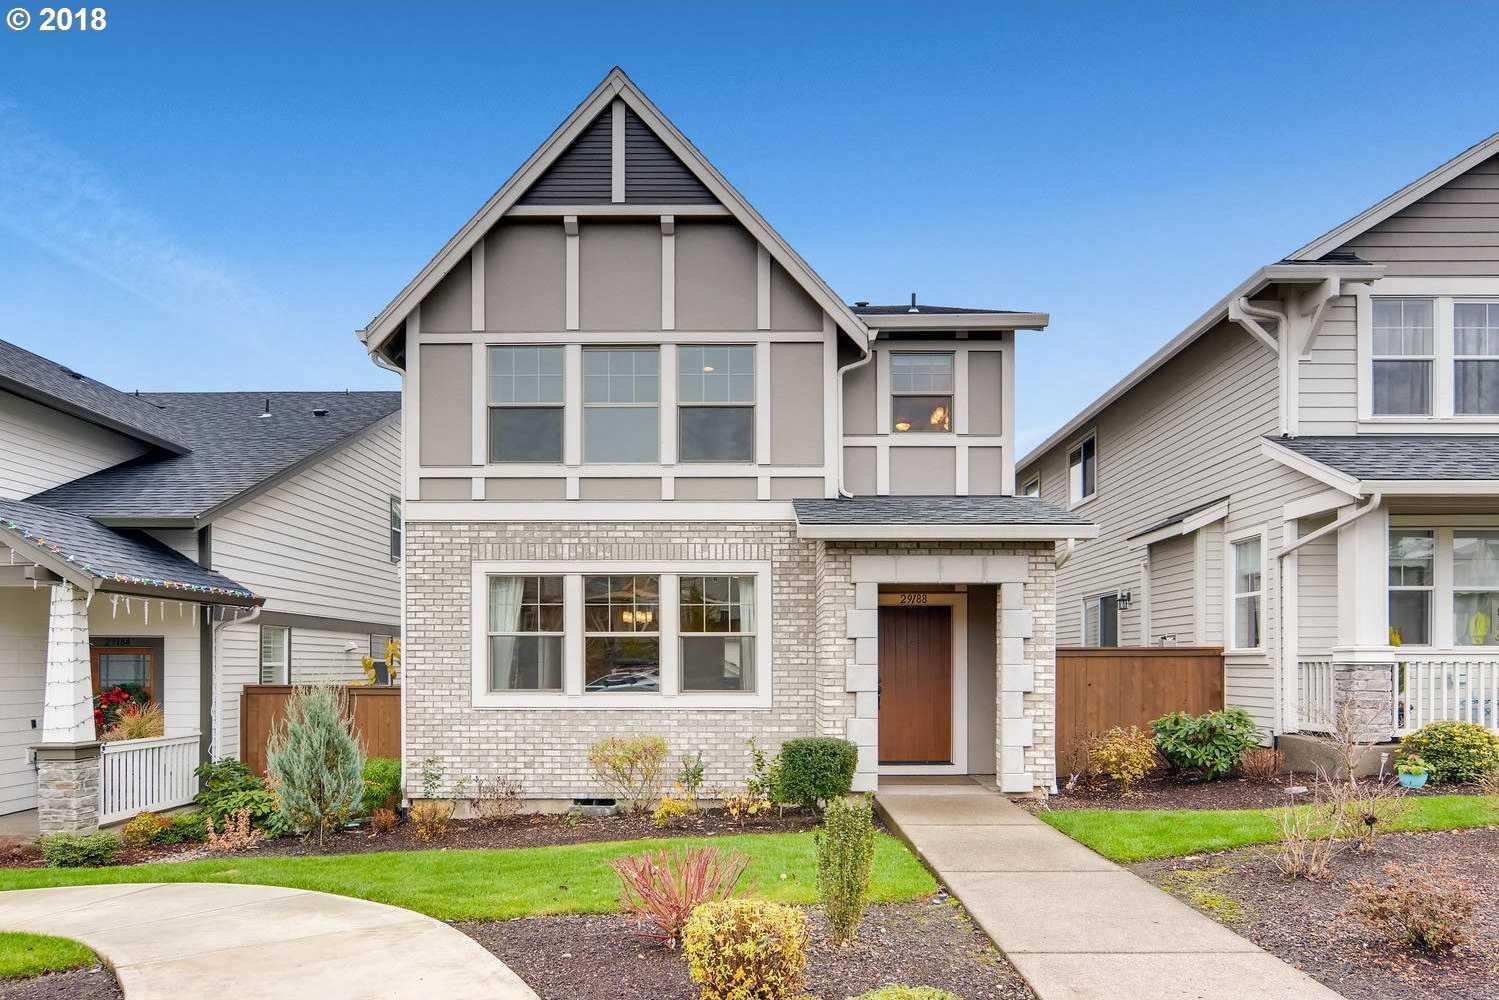 $490,000 - 4Br/3Ba -  for Sale in Wilsonville